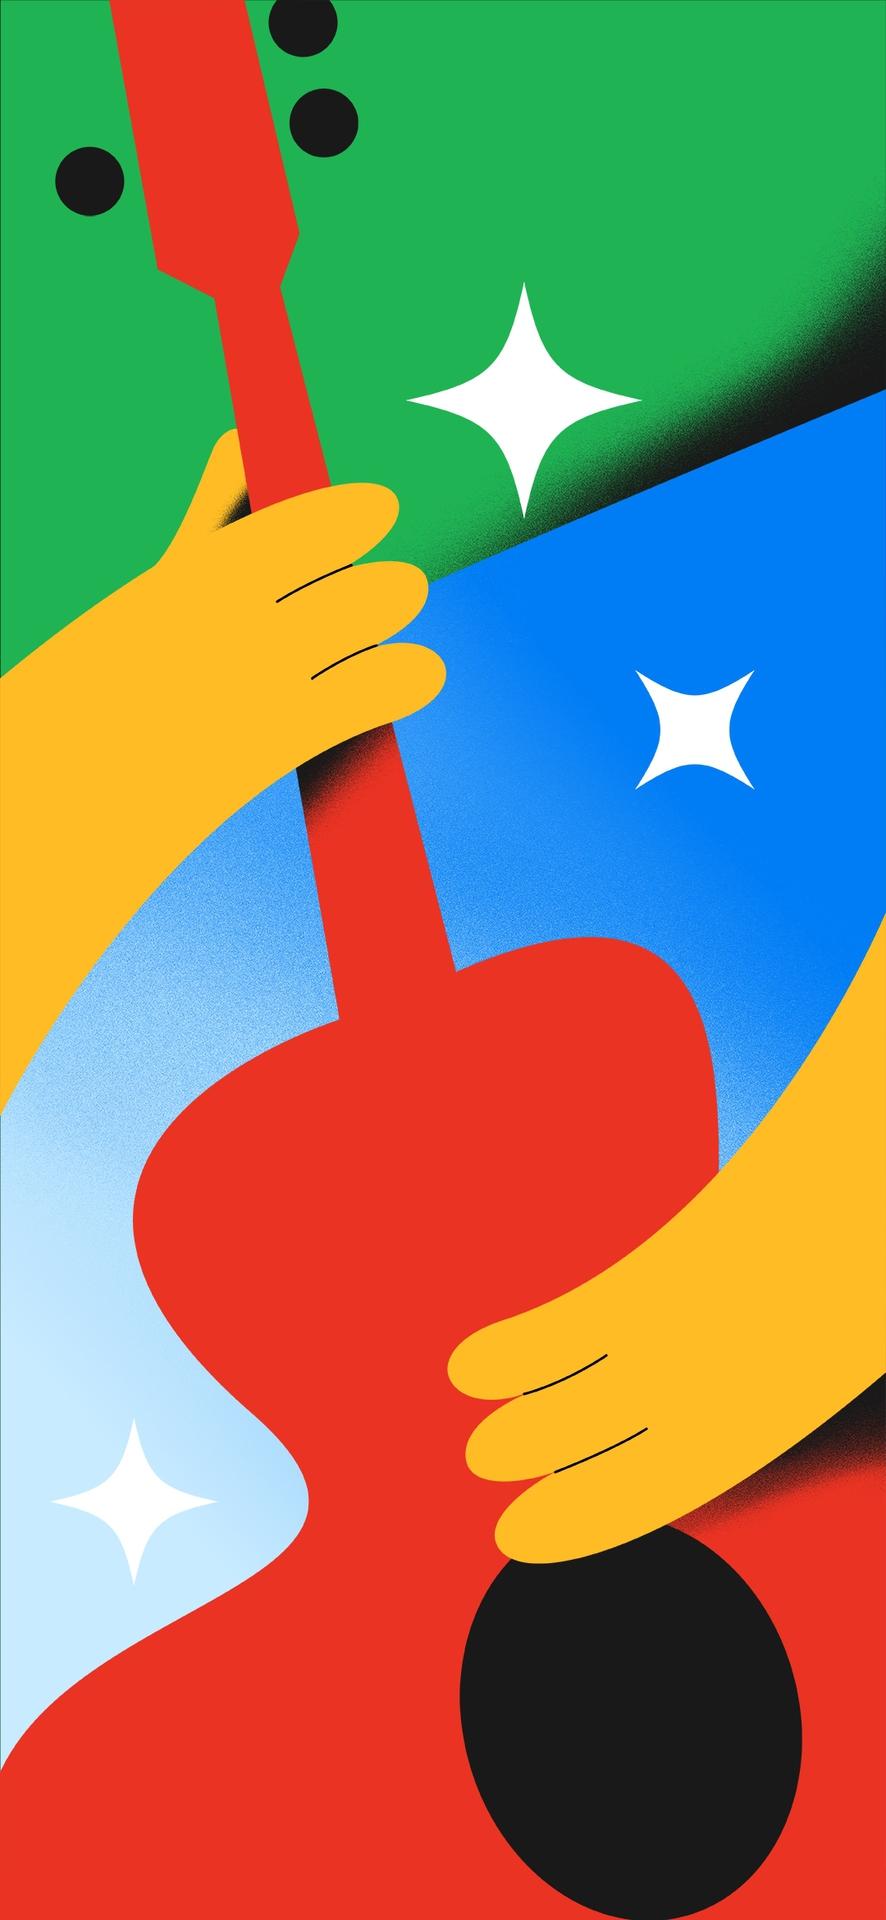 Google Pixel 4a wallpapers 4